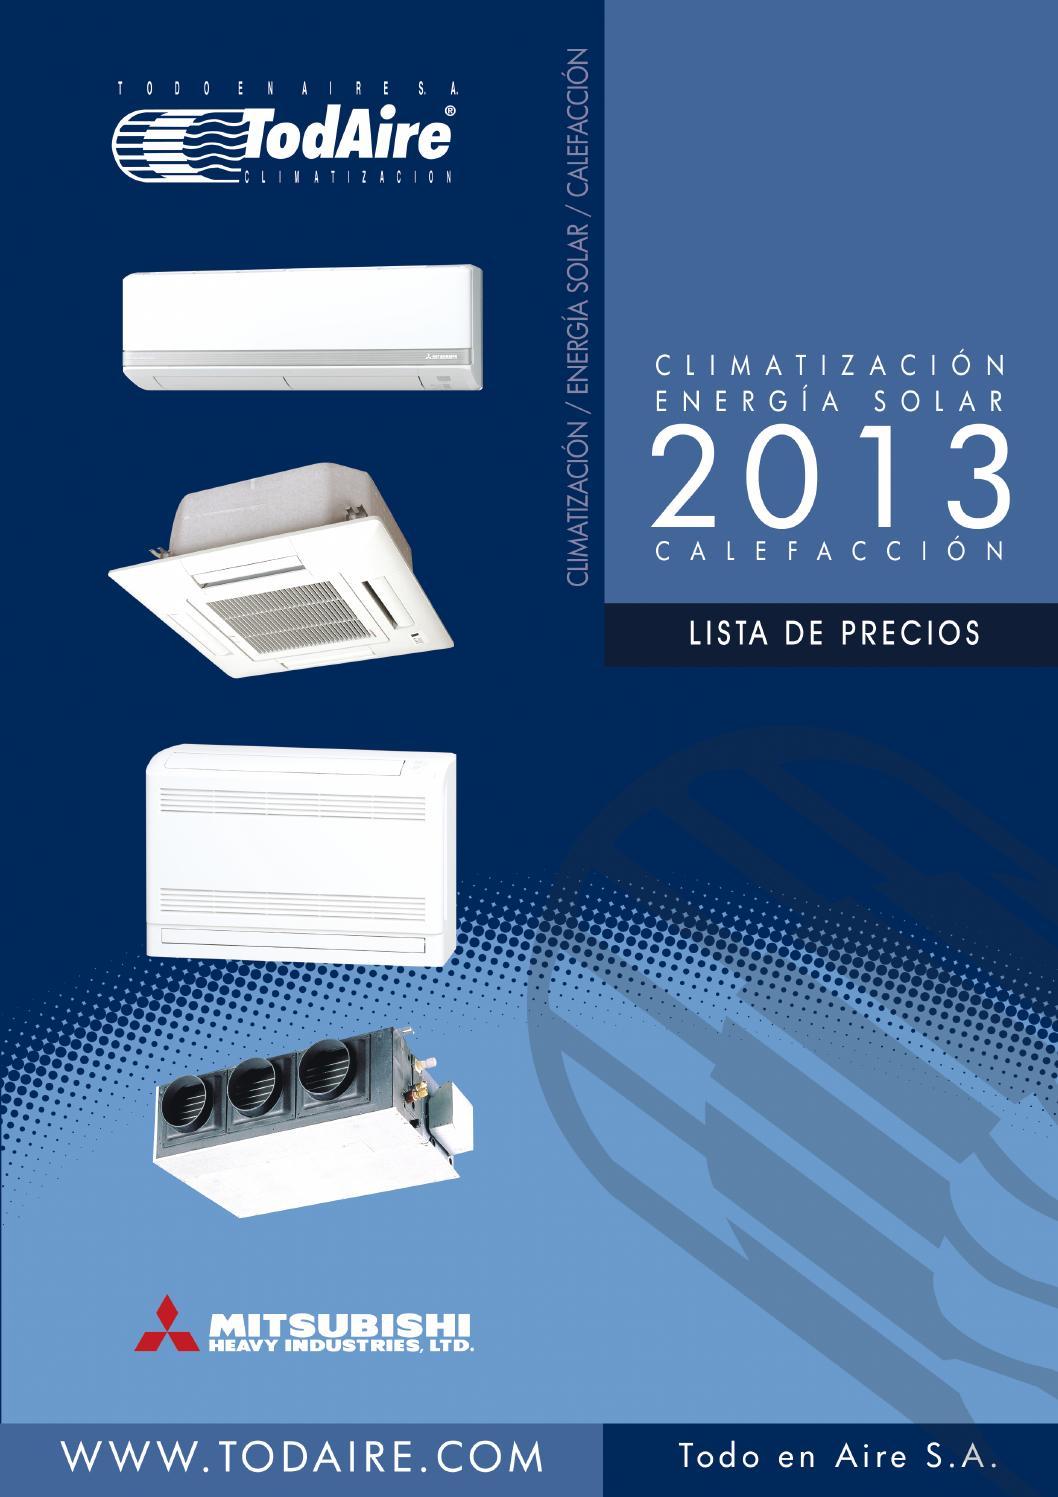 Tarifa climatizaci n todaire 2013 by javier garcia issuu for Aire acondicionado johnson precios